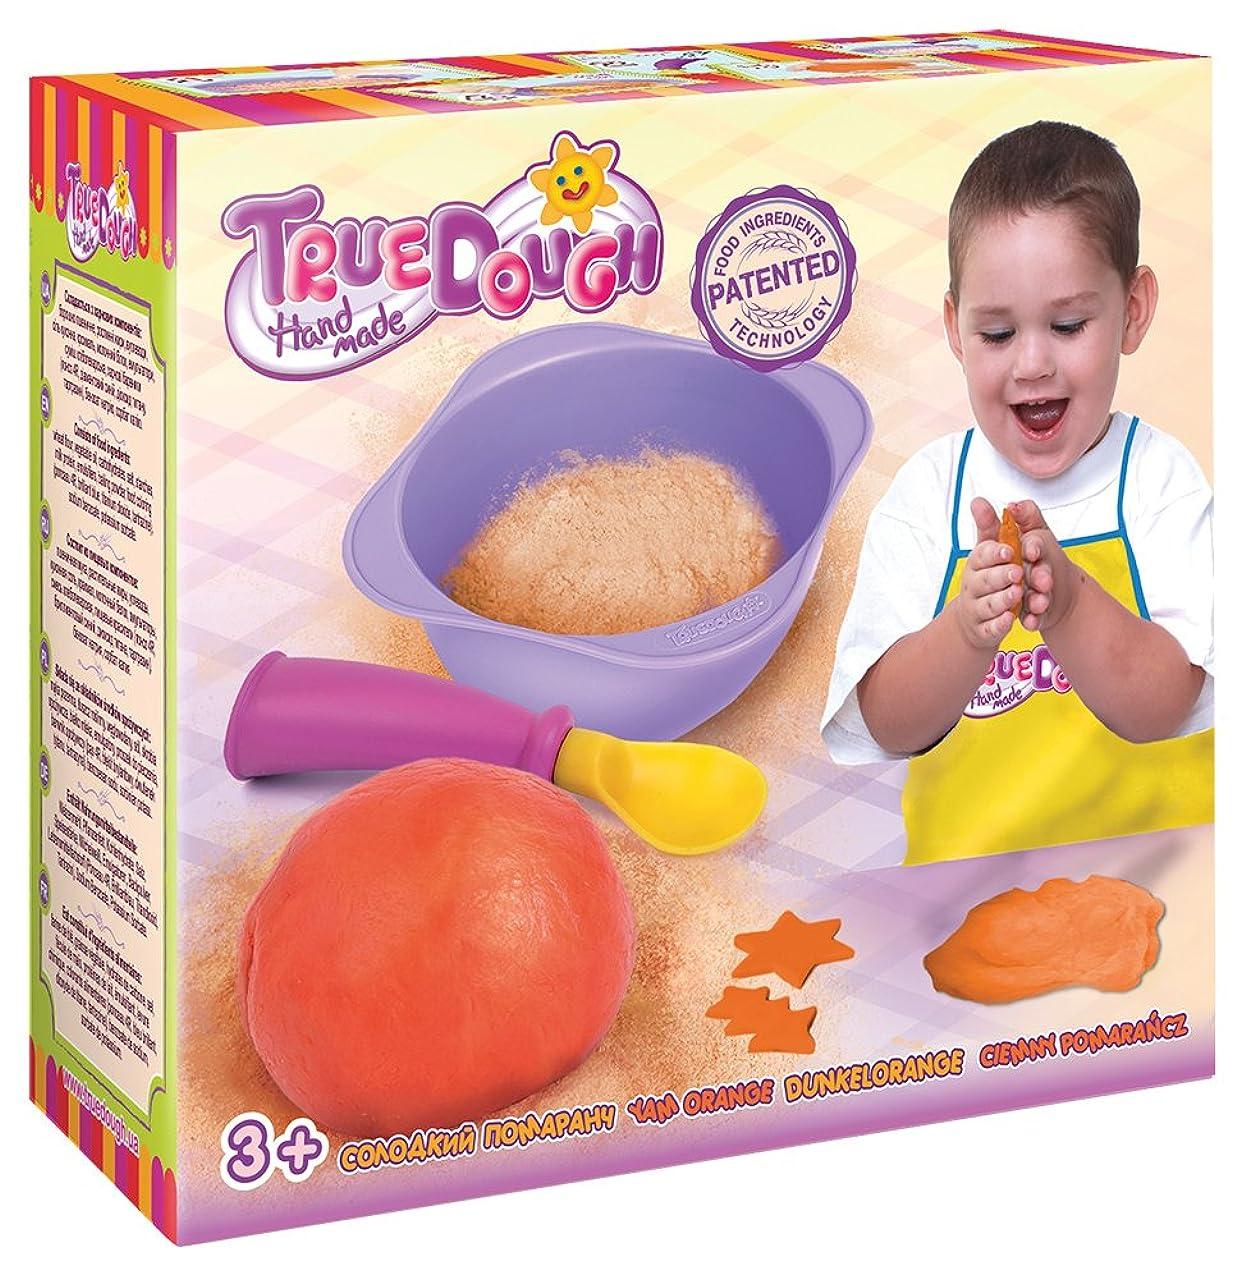 TrueDOUGH 21014 Make Your Own Modelling Dough Single Pack Set, Yam Orange